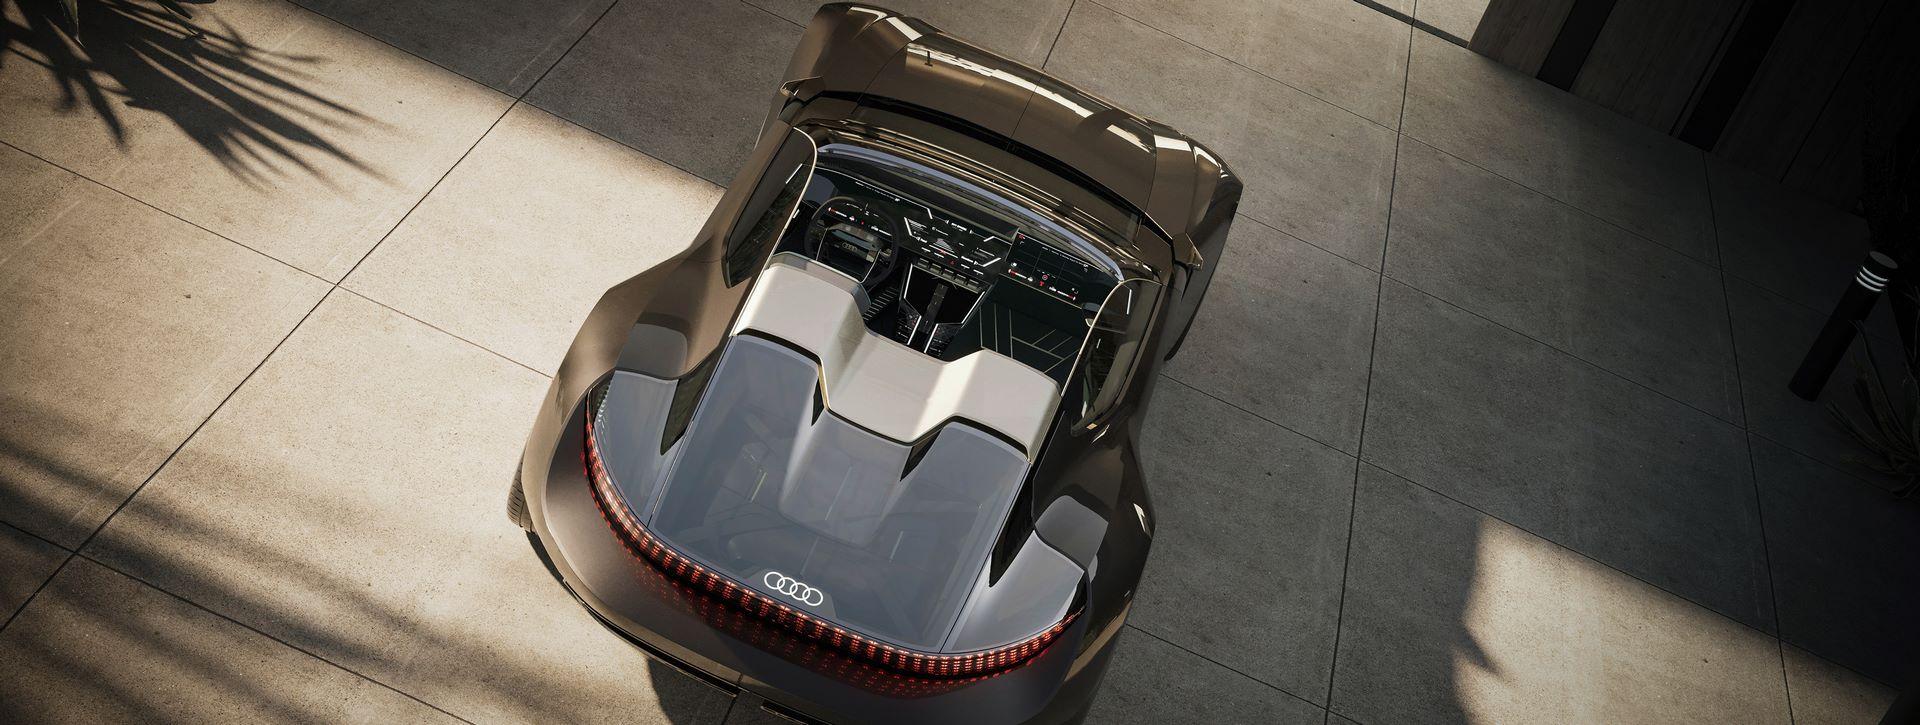 Audi-Skysphere-Concept-26